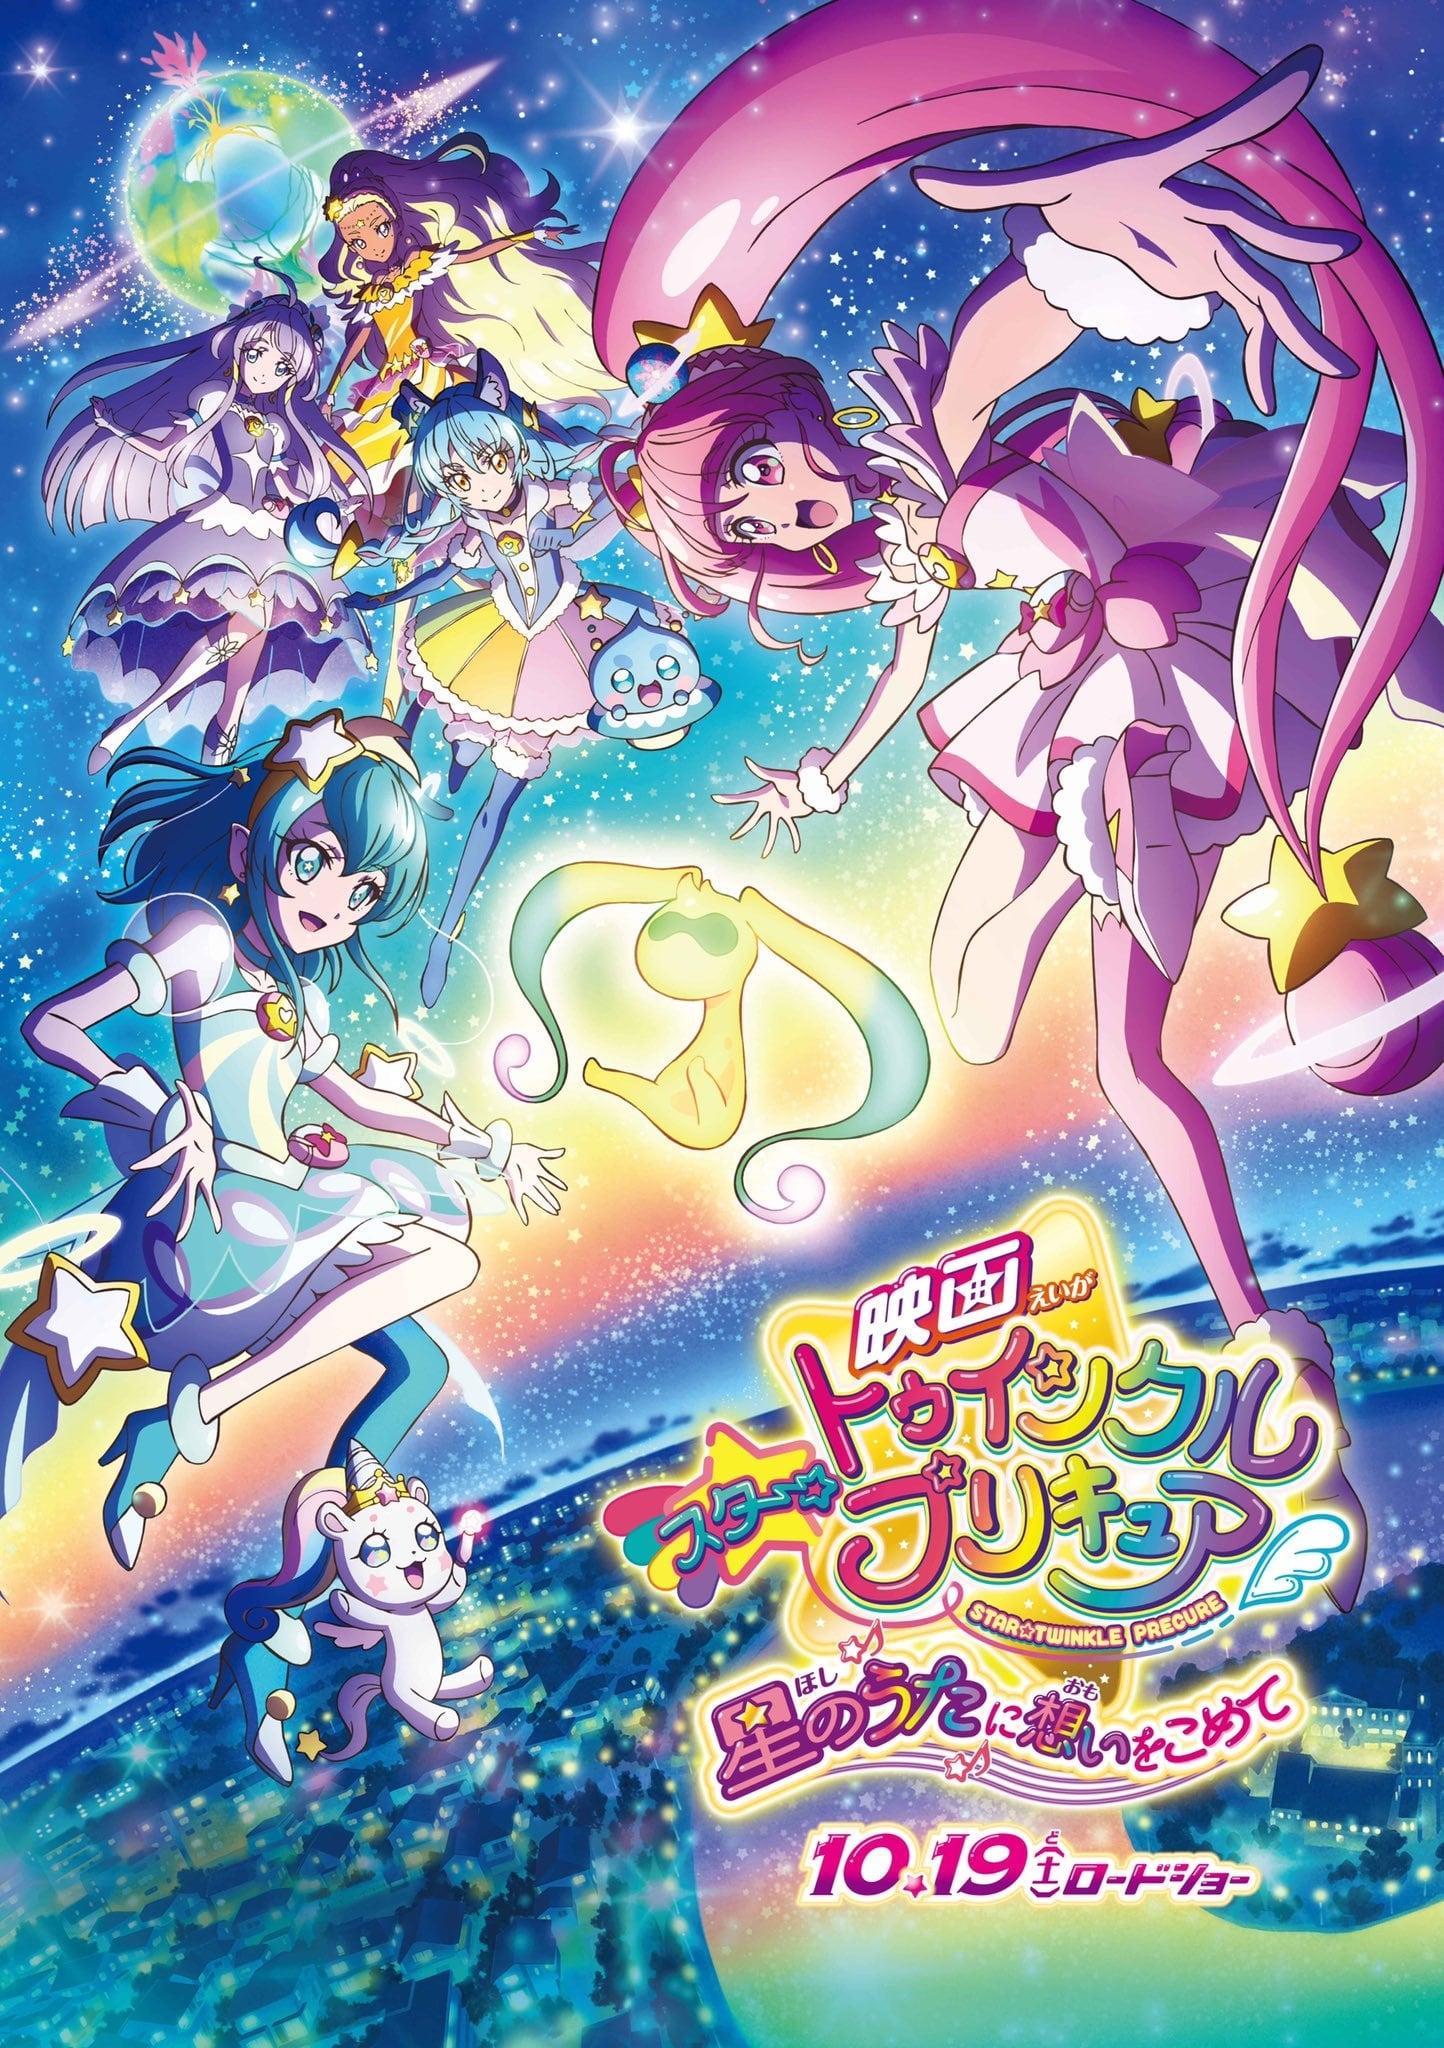 Star☆Twinkle Precure: Hoshi no Uta ni Omoi wo Komete (2019)